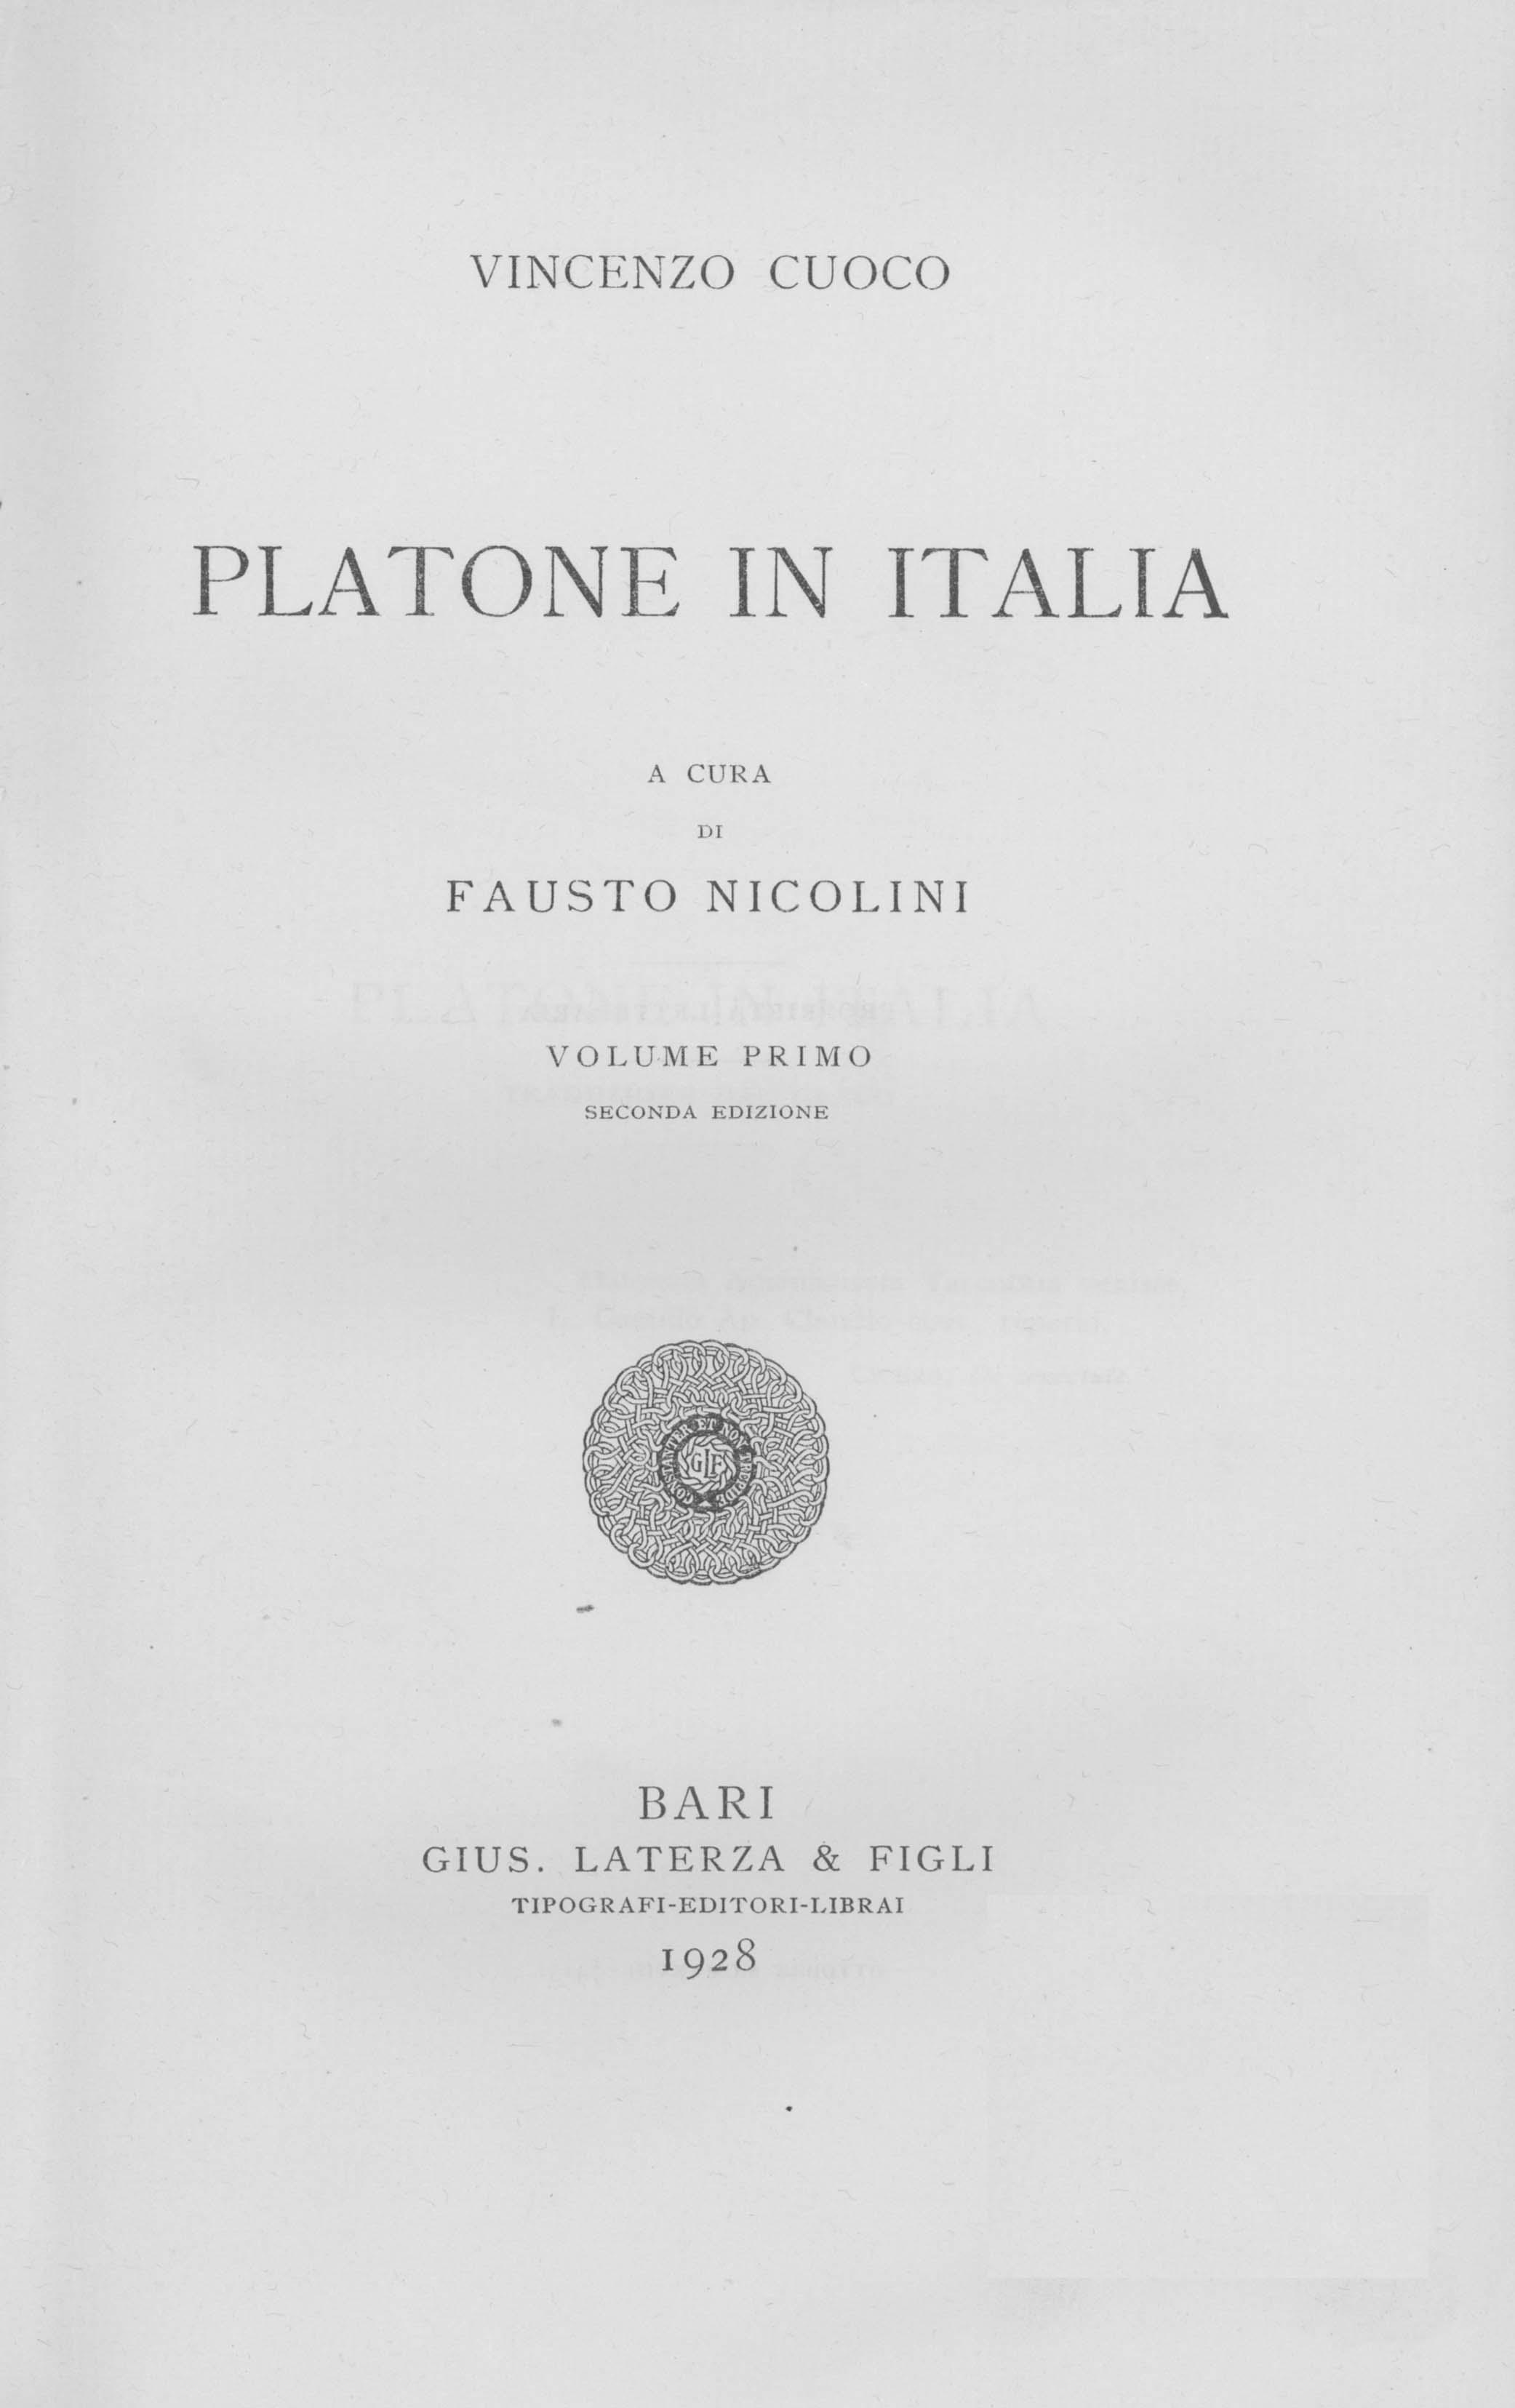 ''Platone in Italia'', 1916